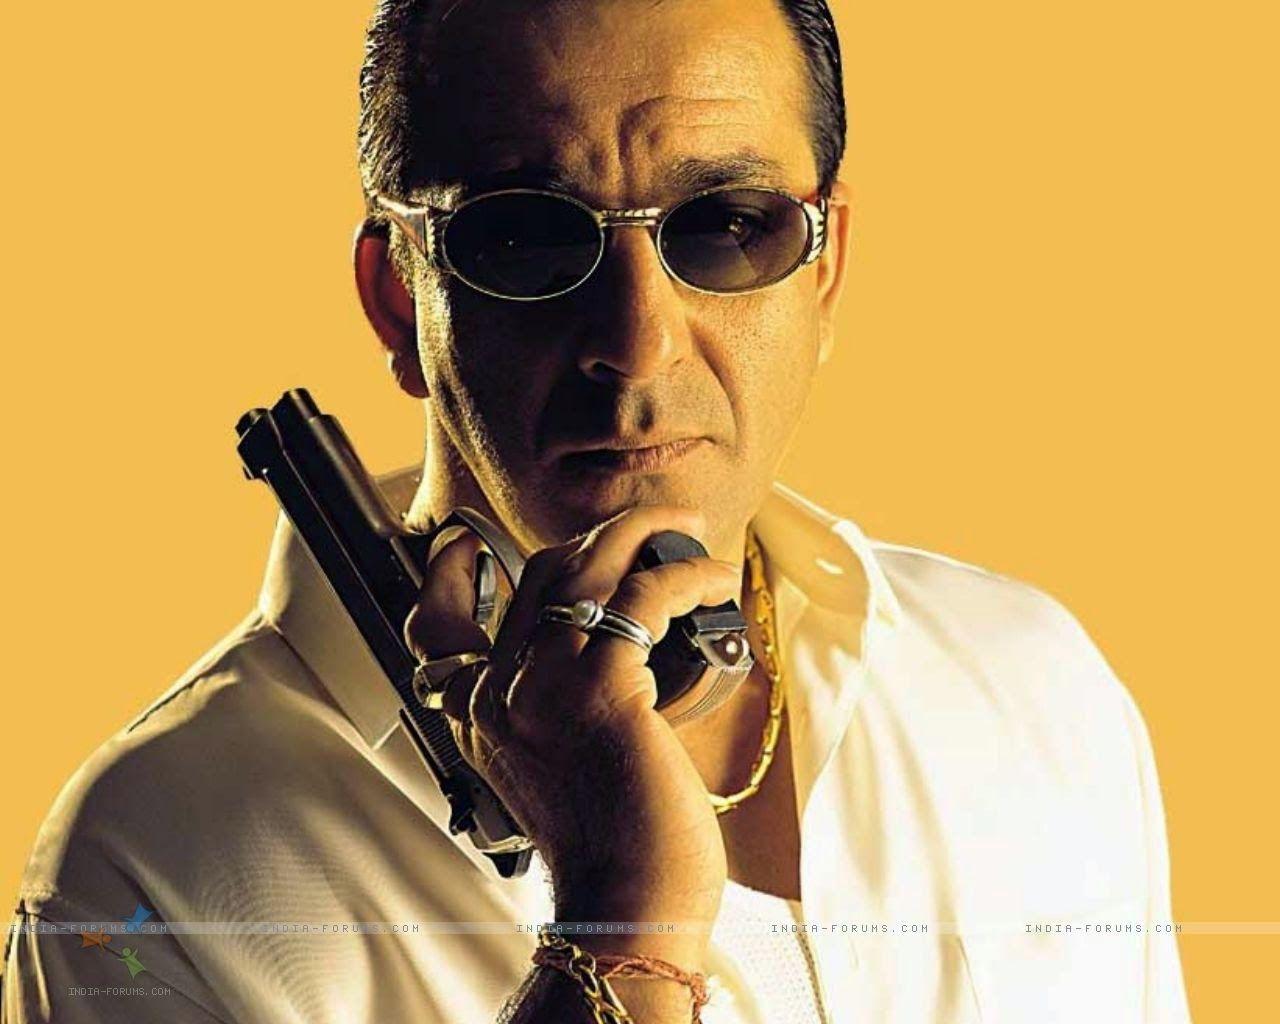 Sanjay Dutt Hq Wallpaper Baba In 2019 Actors Bollywood Stars